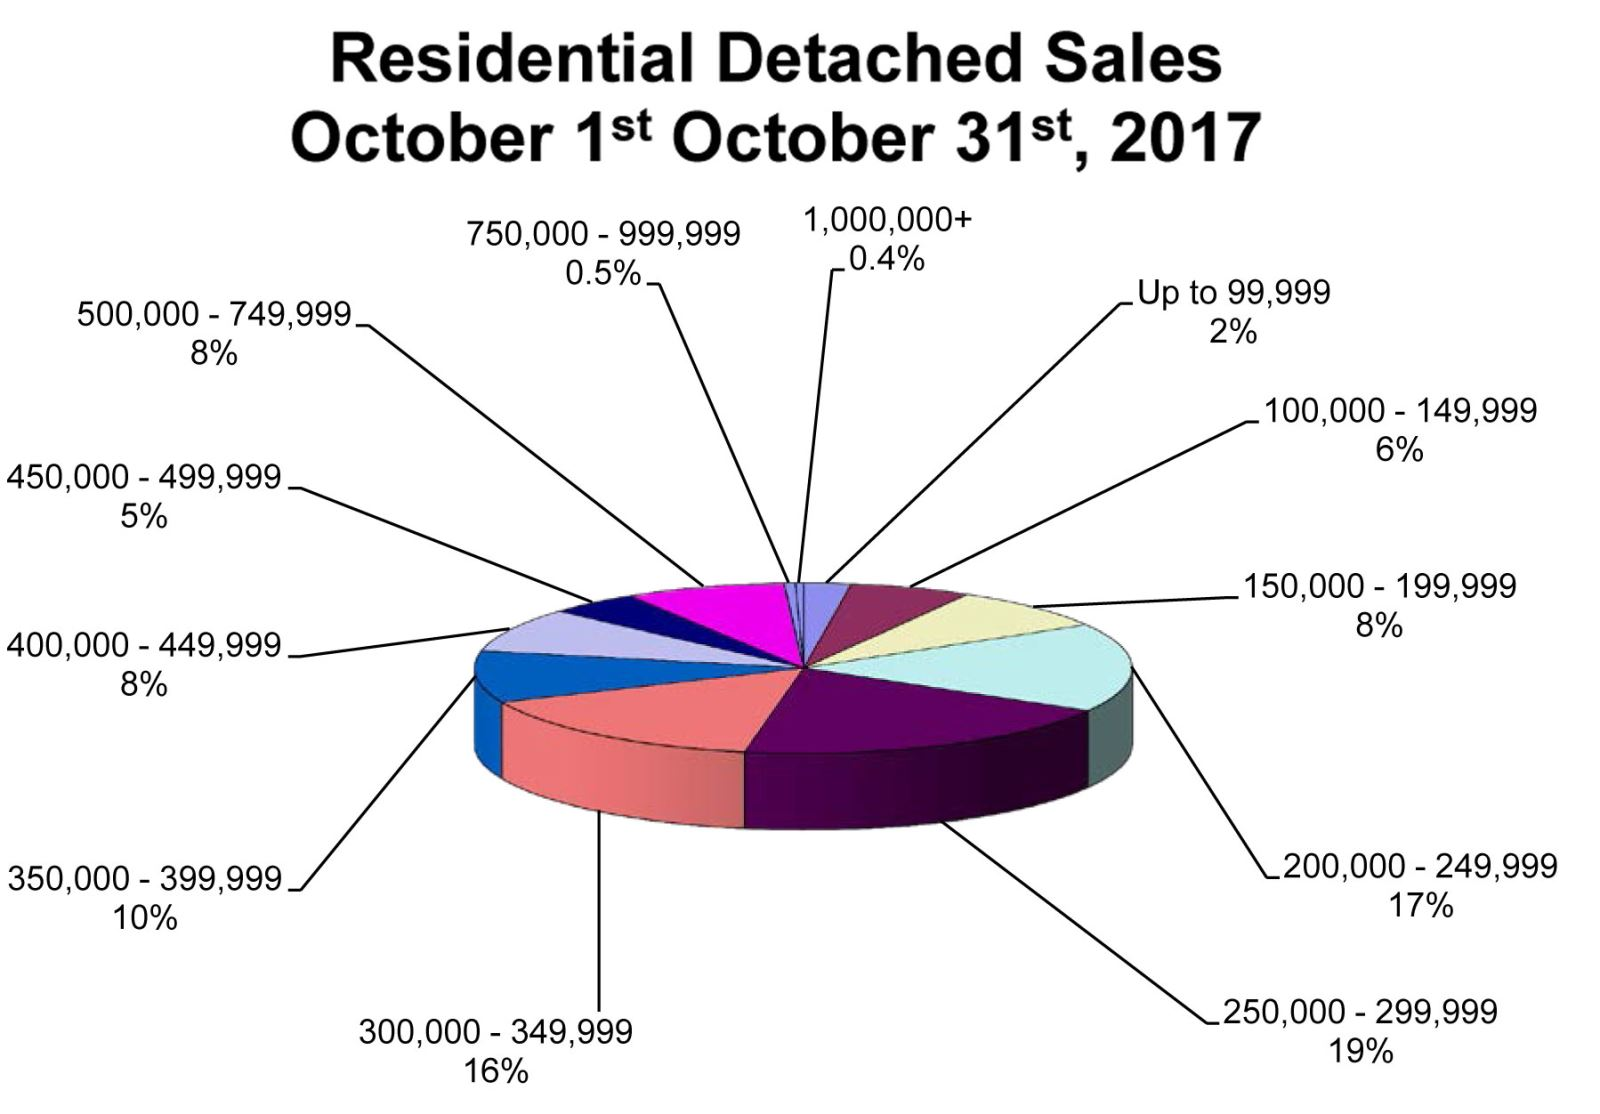 RD-Sales-Pie-Chart-October-2017.jpg